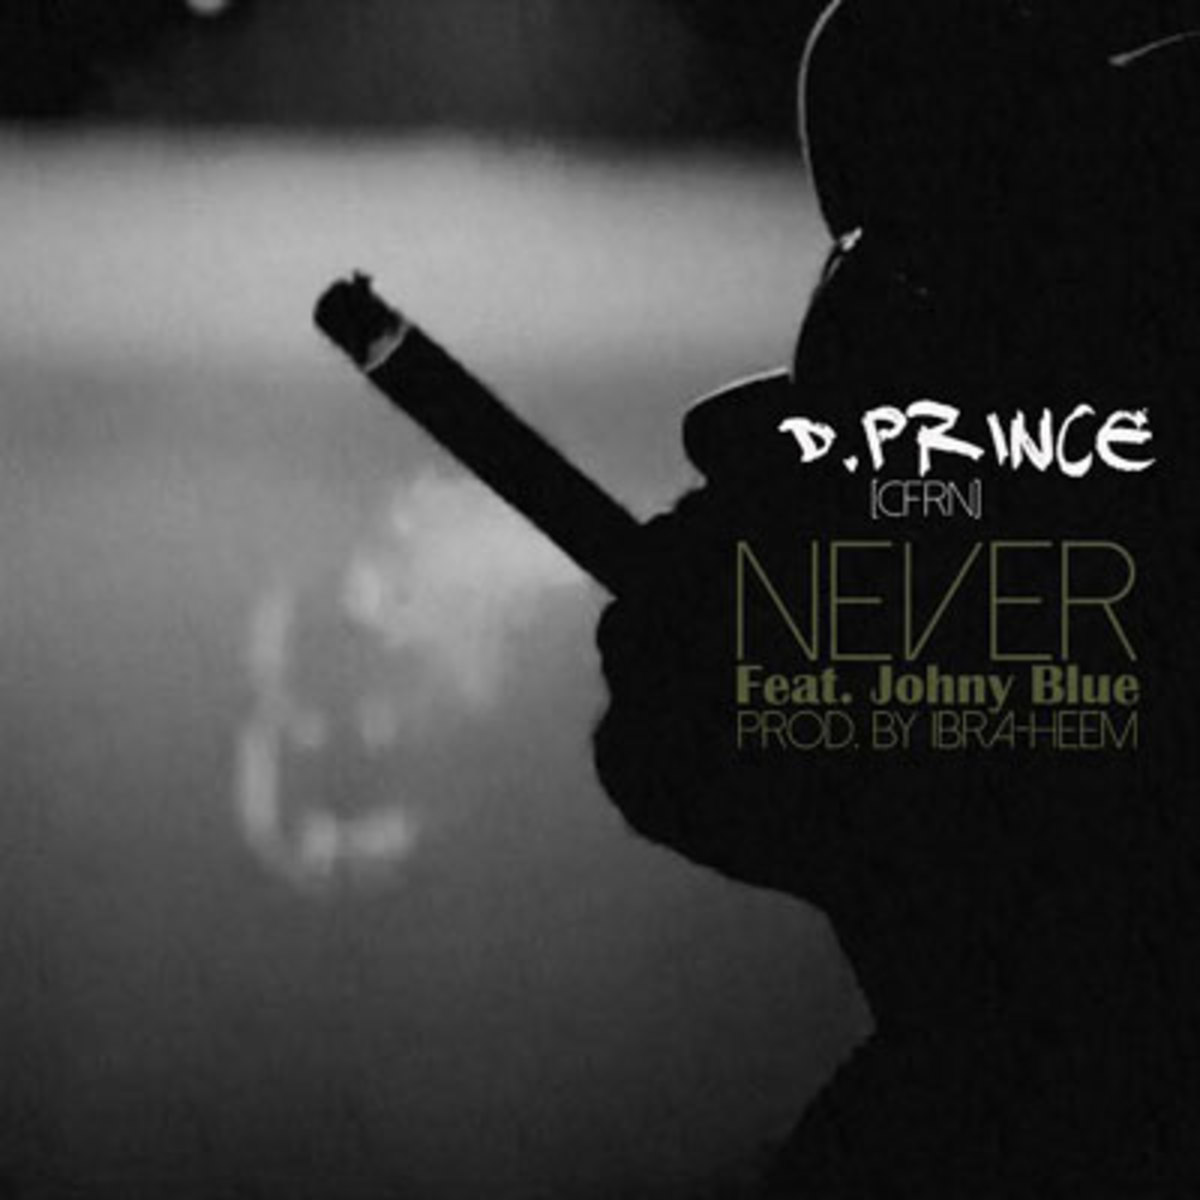 dprince-never.jpg